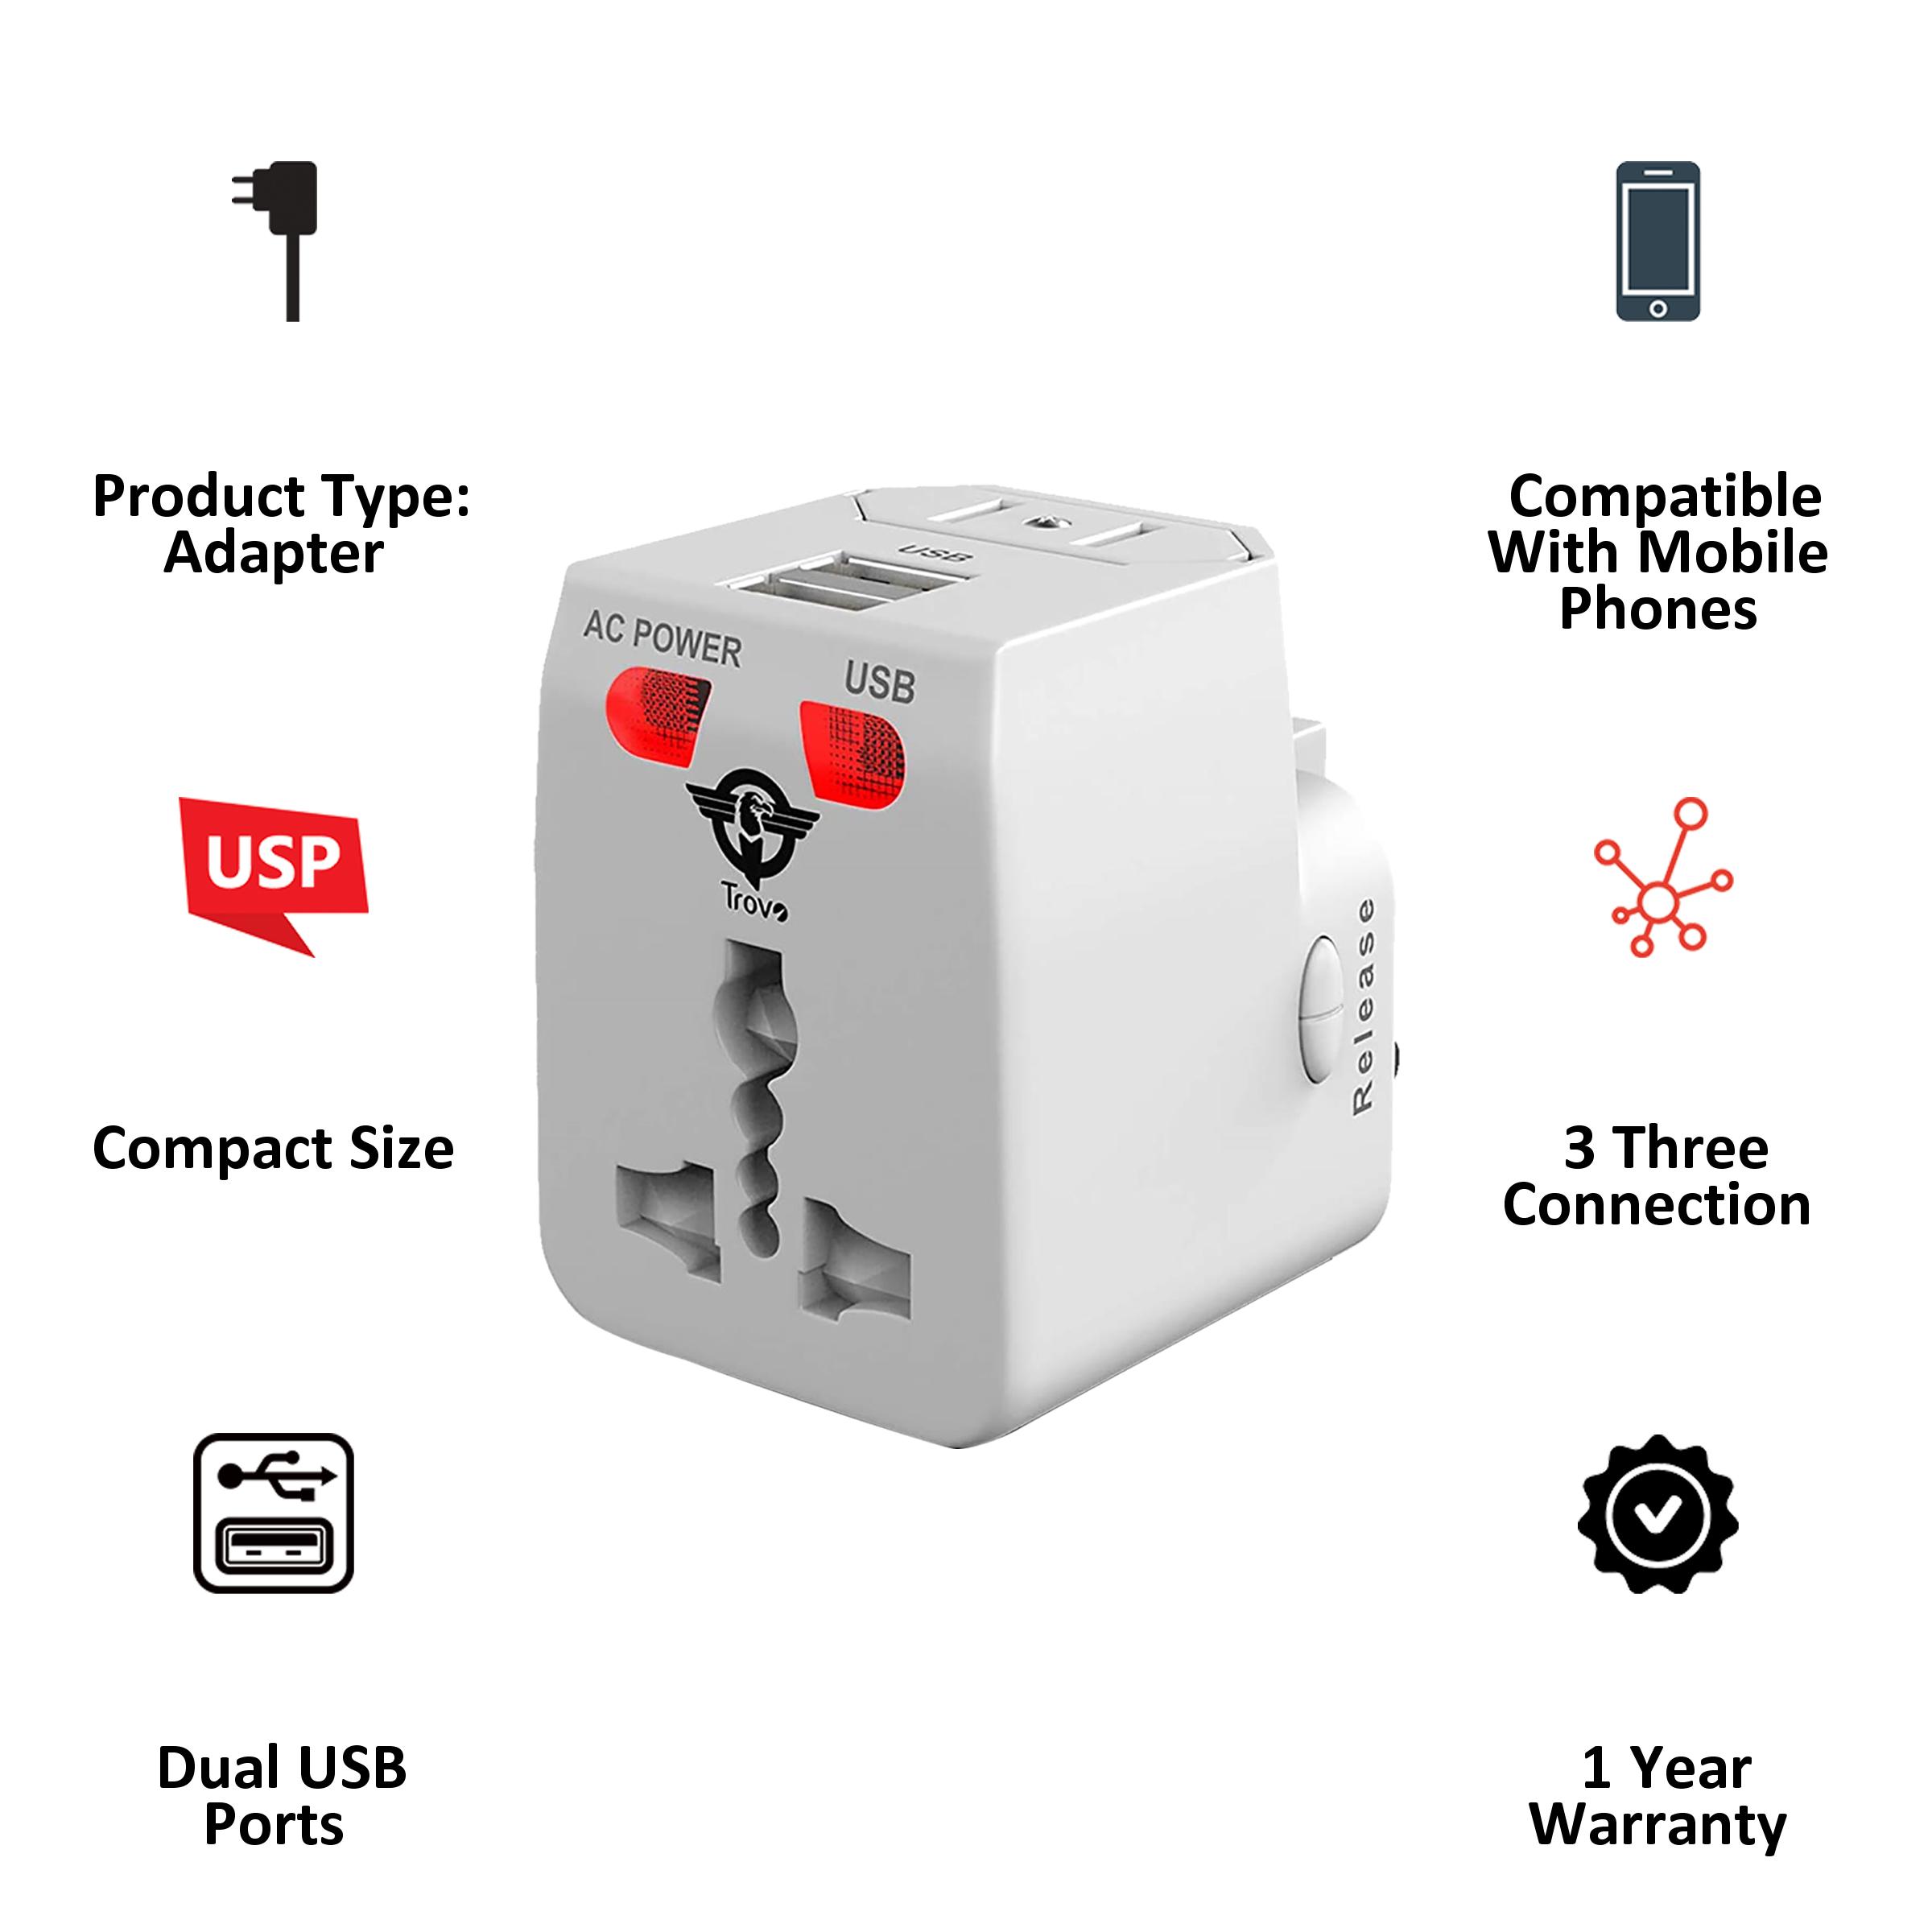 Trovo Plug Pack Lite 3 Plugs Adapter (Dual USB Ports, TTA-11, White)_3